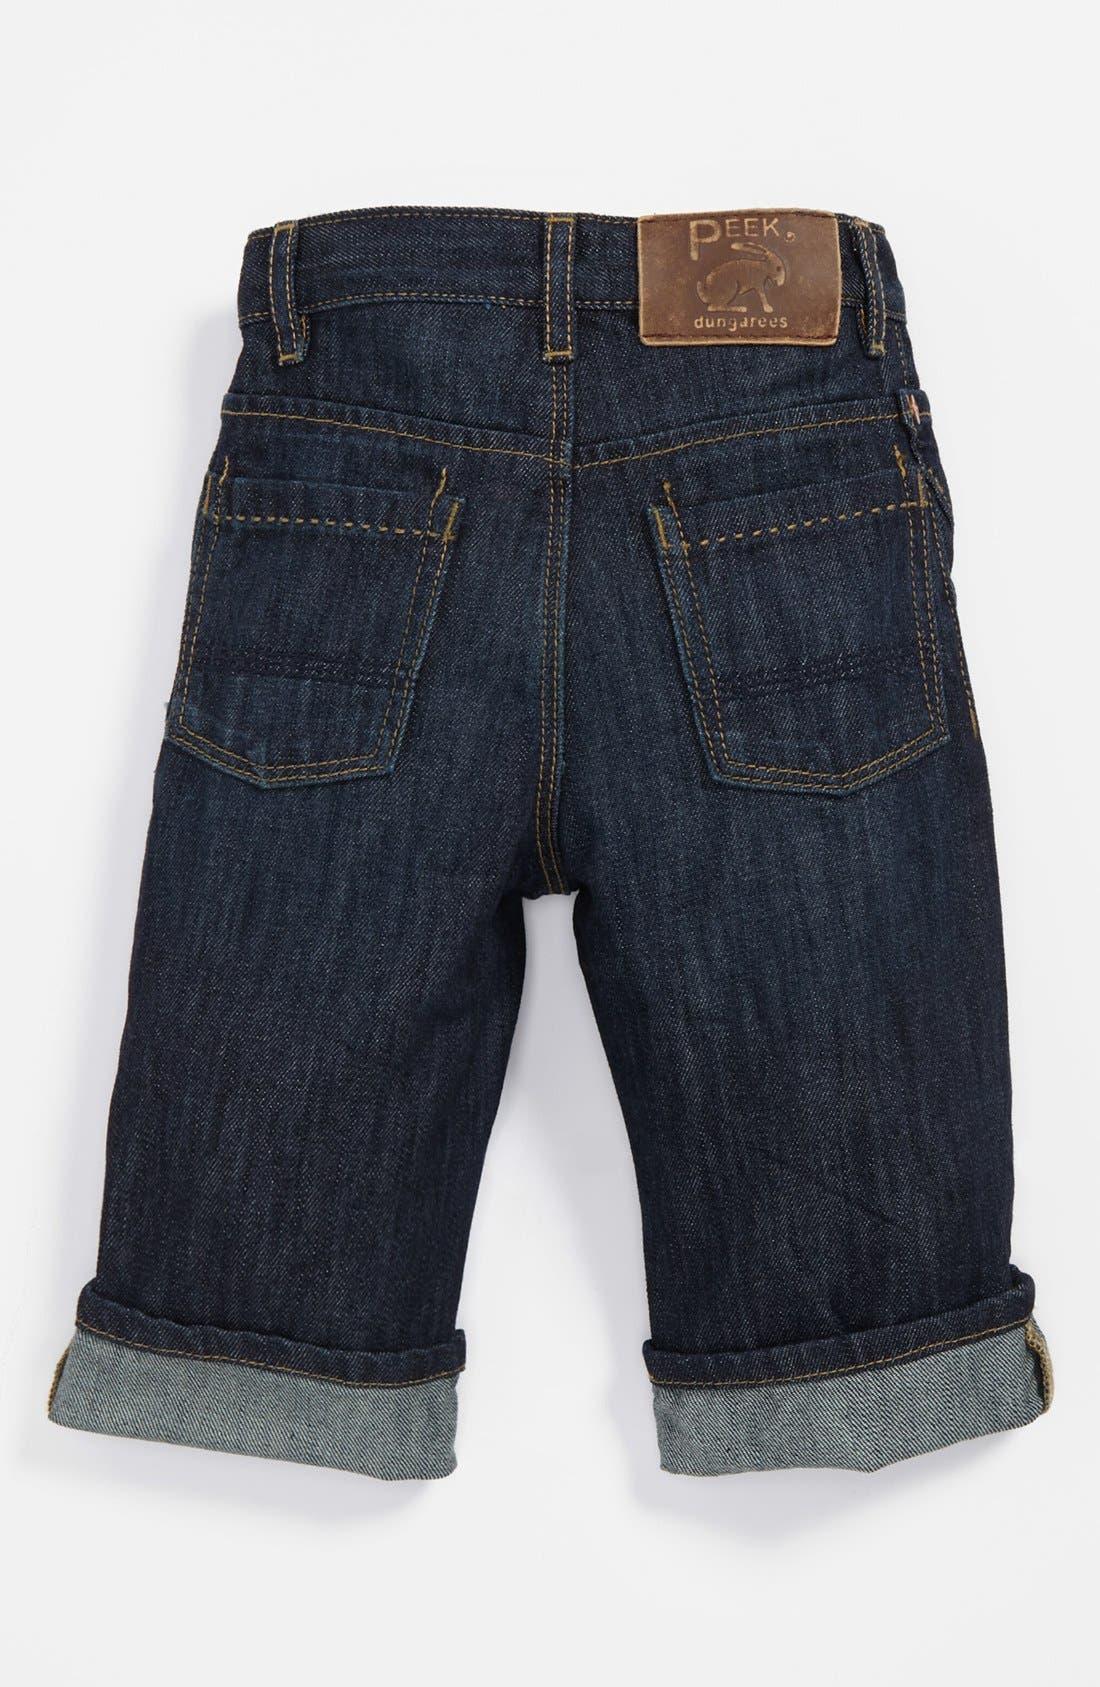 Main Image - Peek 'Peanut' Jeans (Baby Boys)